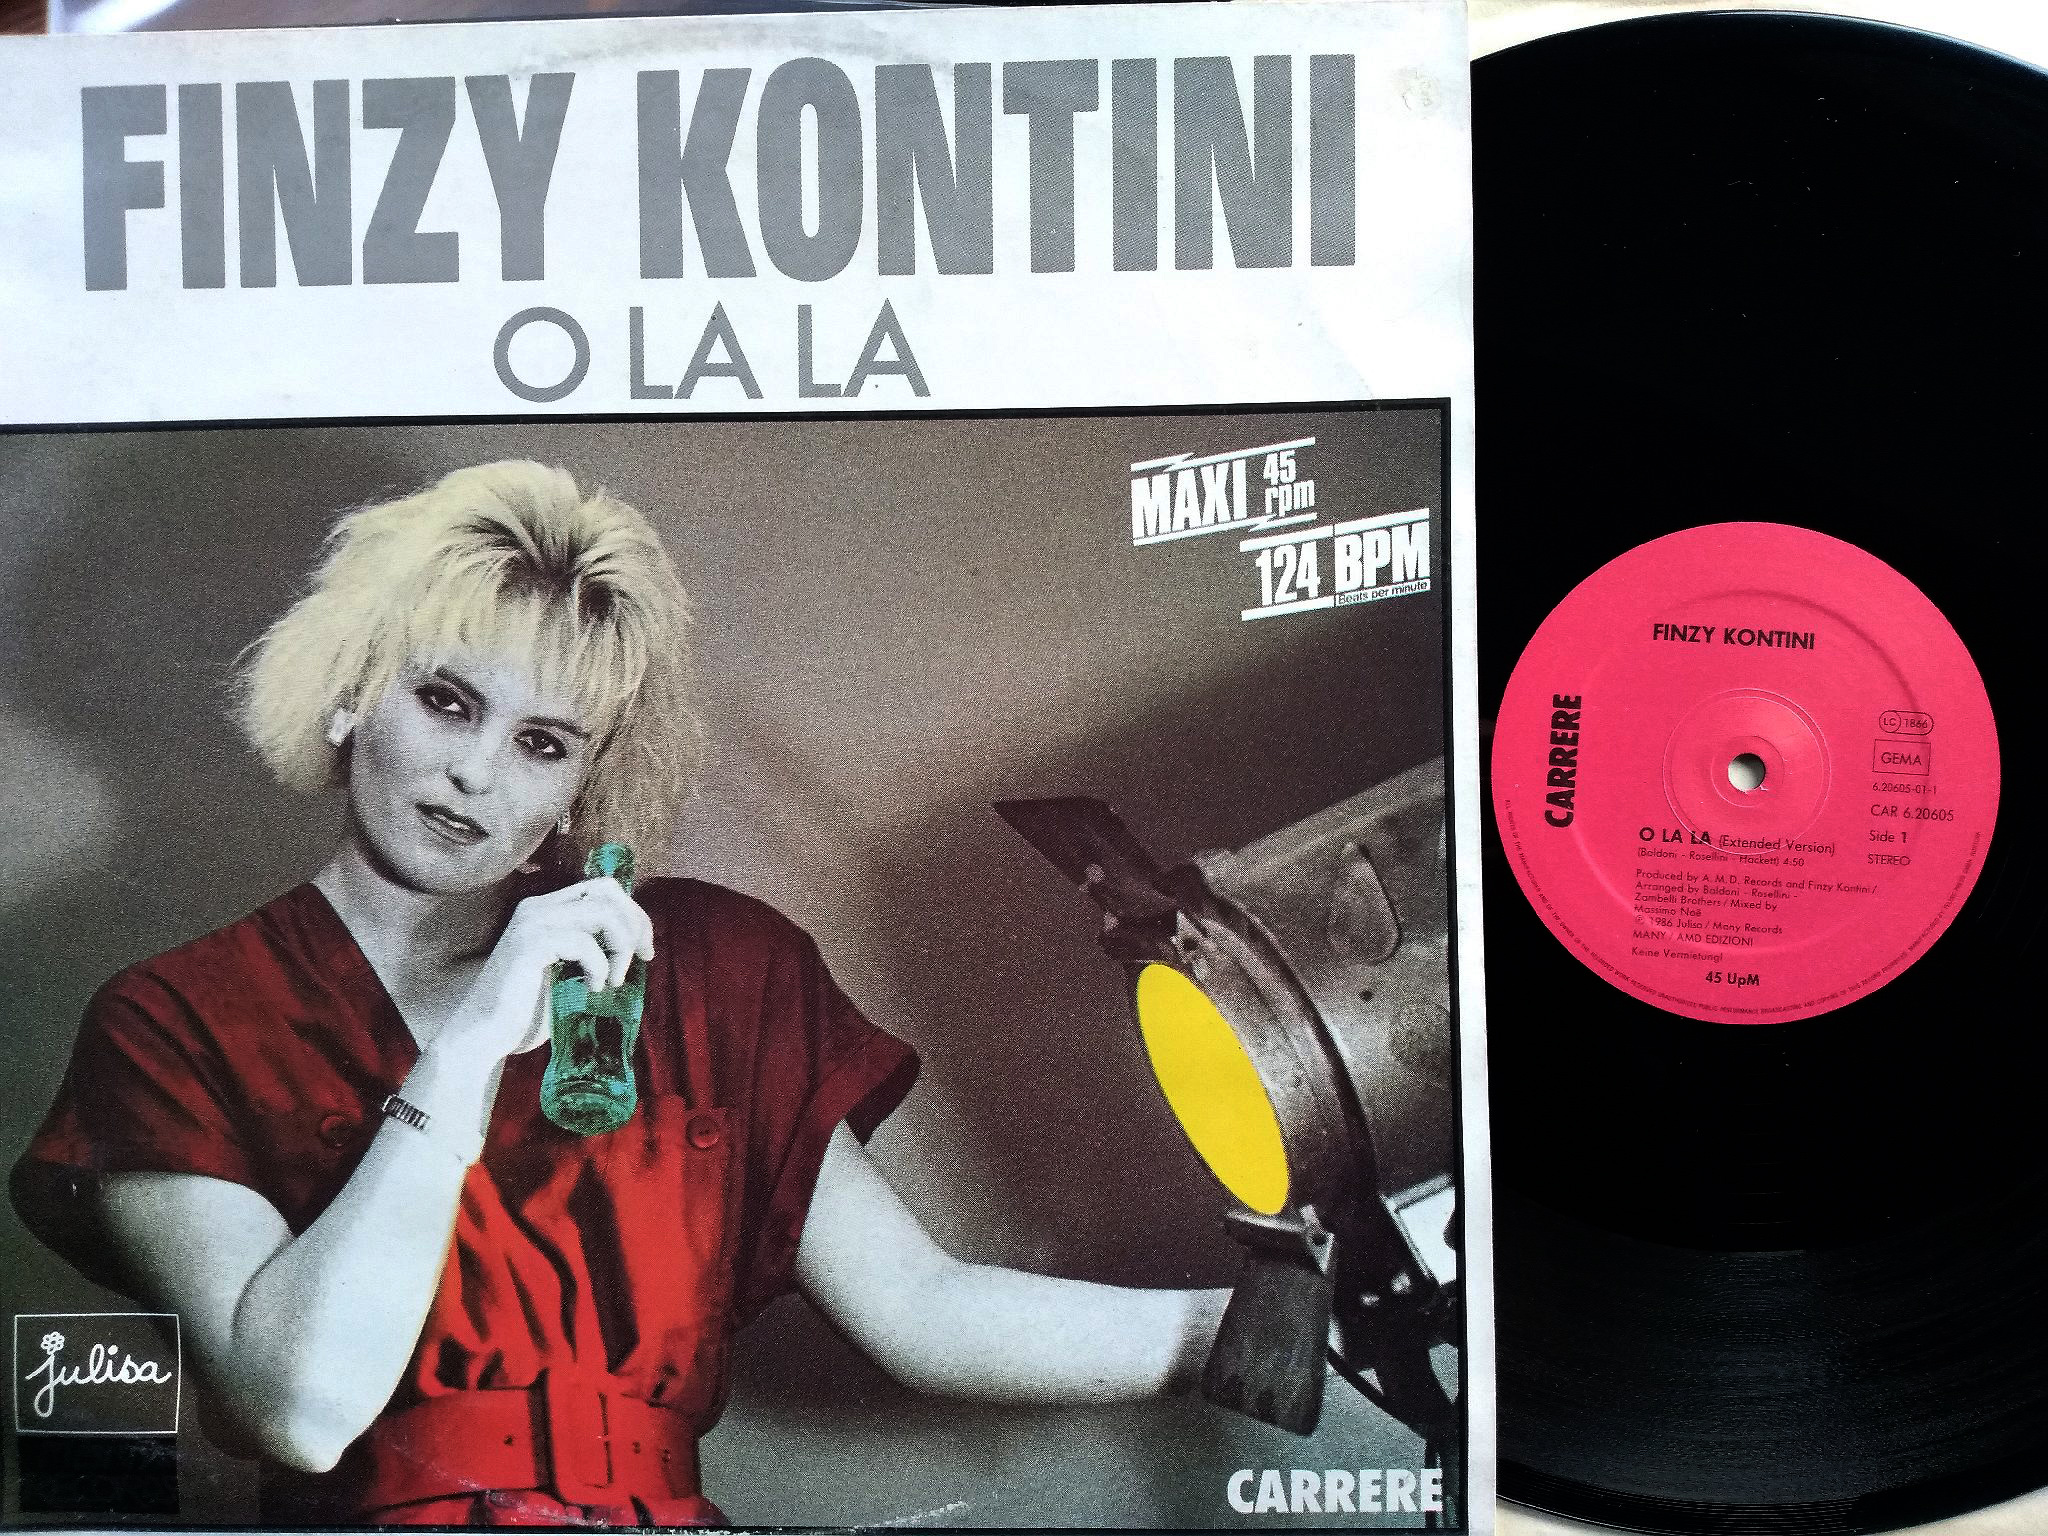 Finzy Kontini - Oh la la